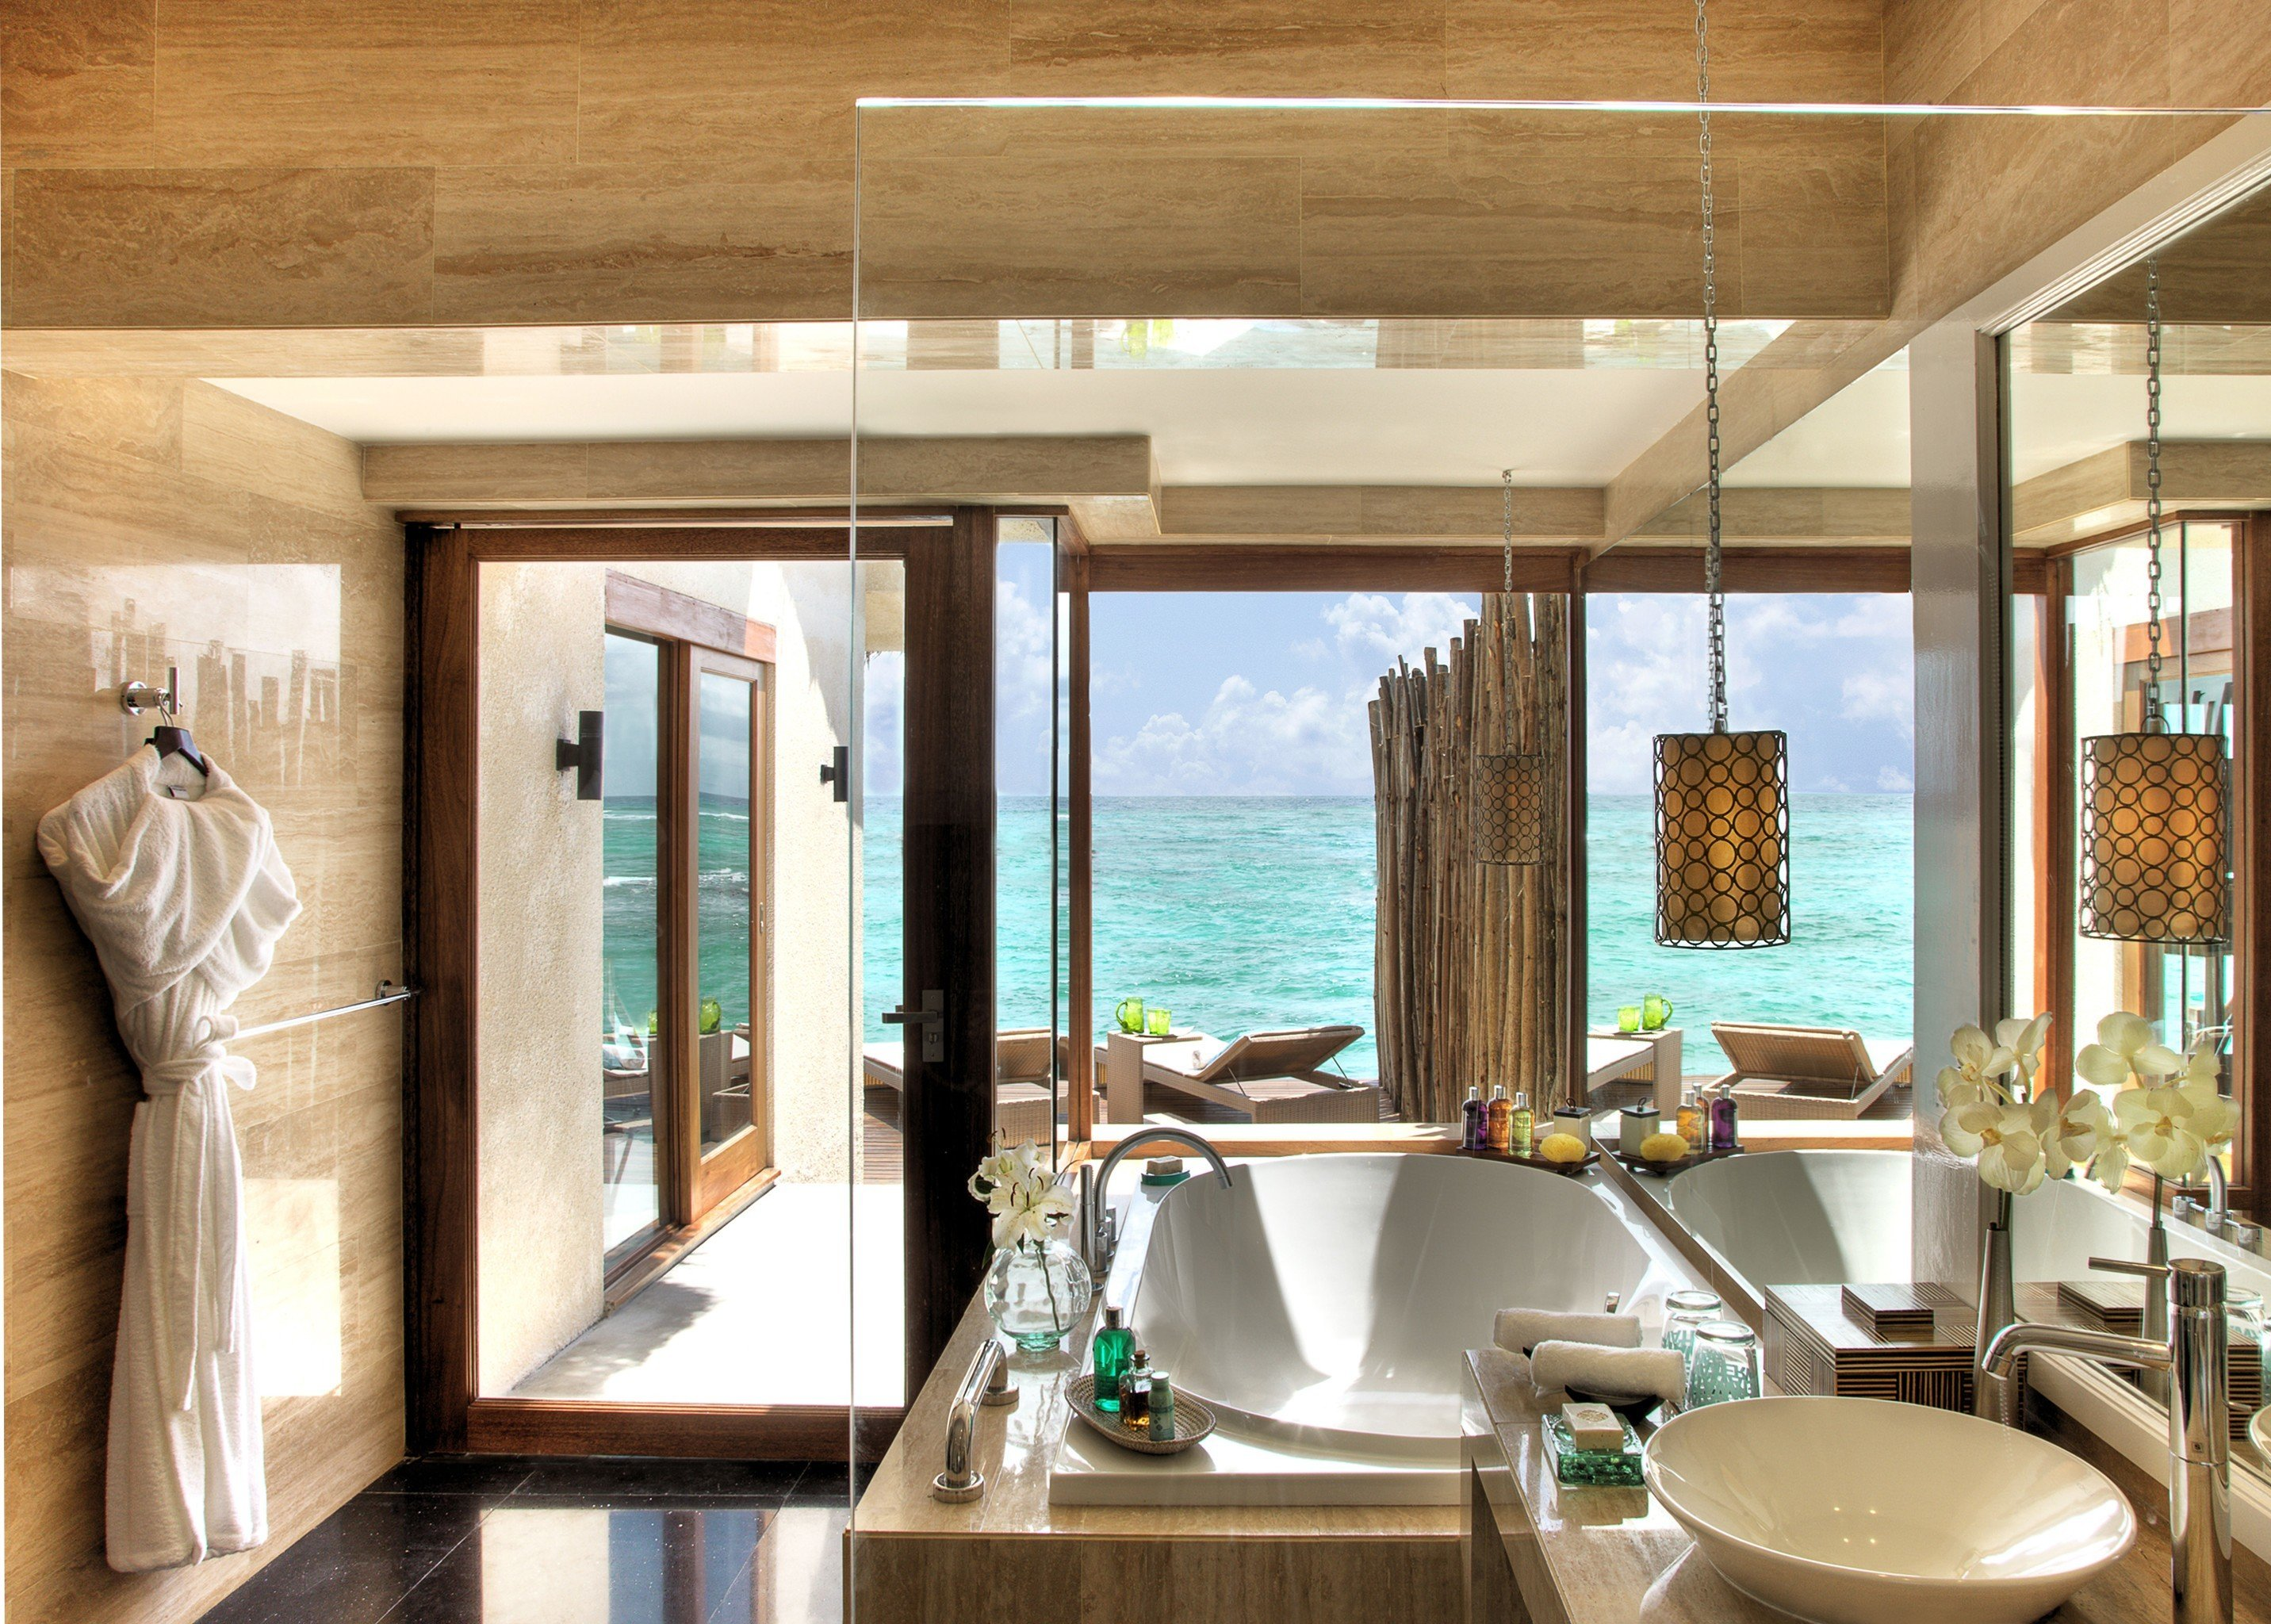 World's Best Hotel Bathrooms on small bathroom pool, toilet pool, indoor outdoor shower,